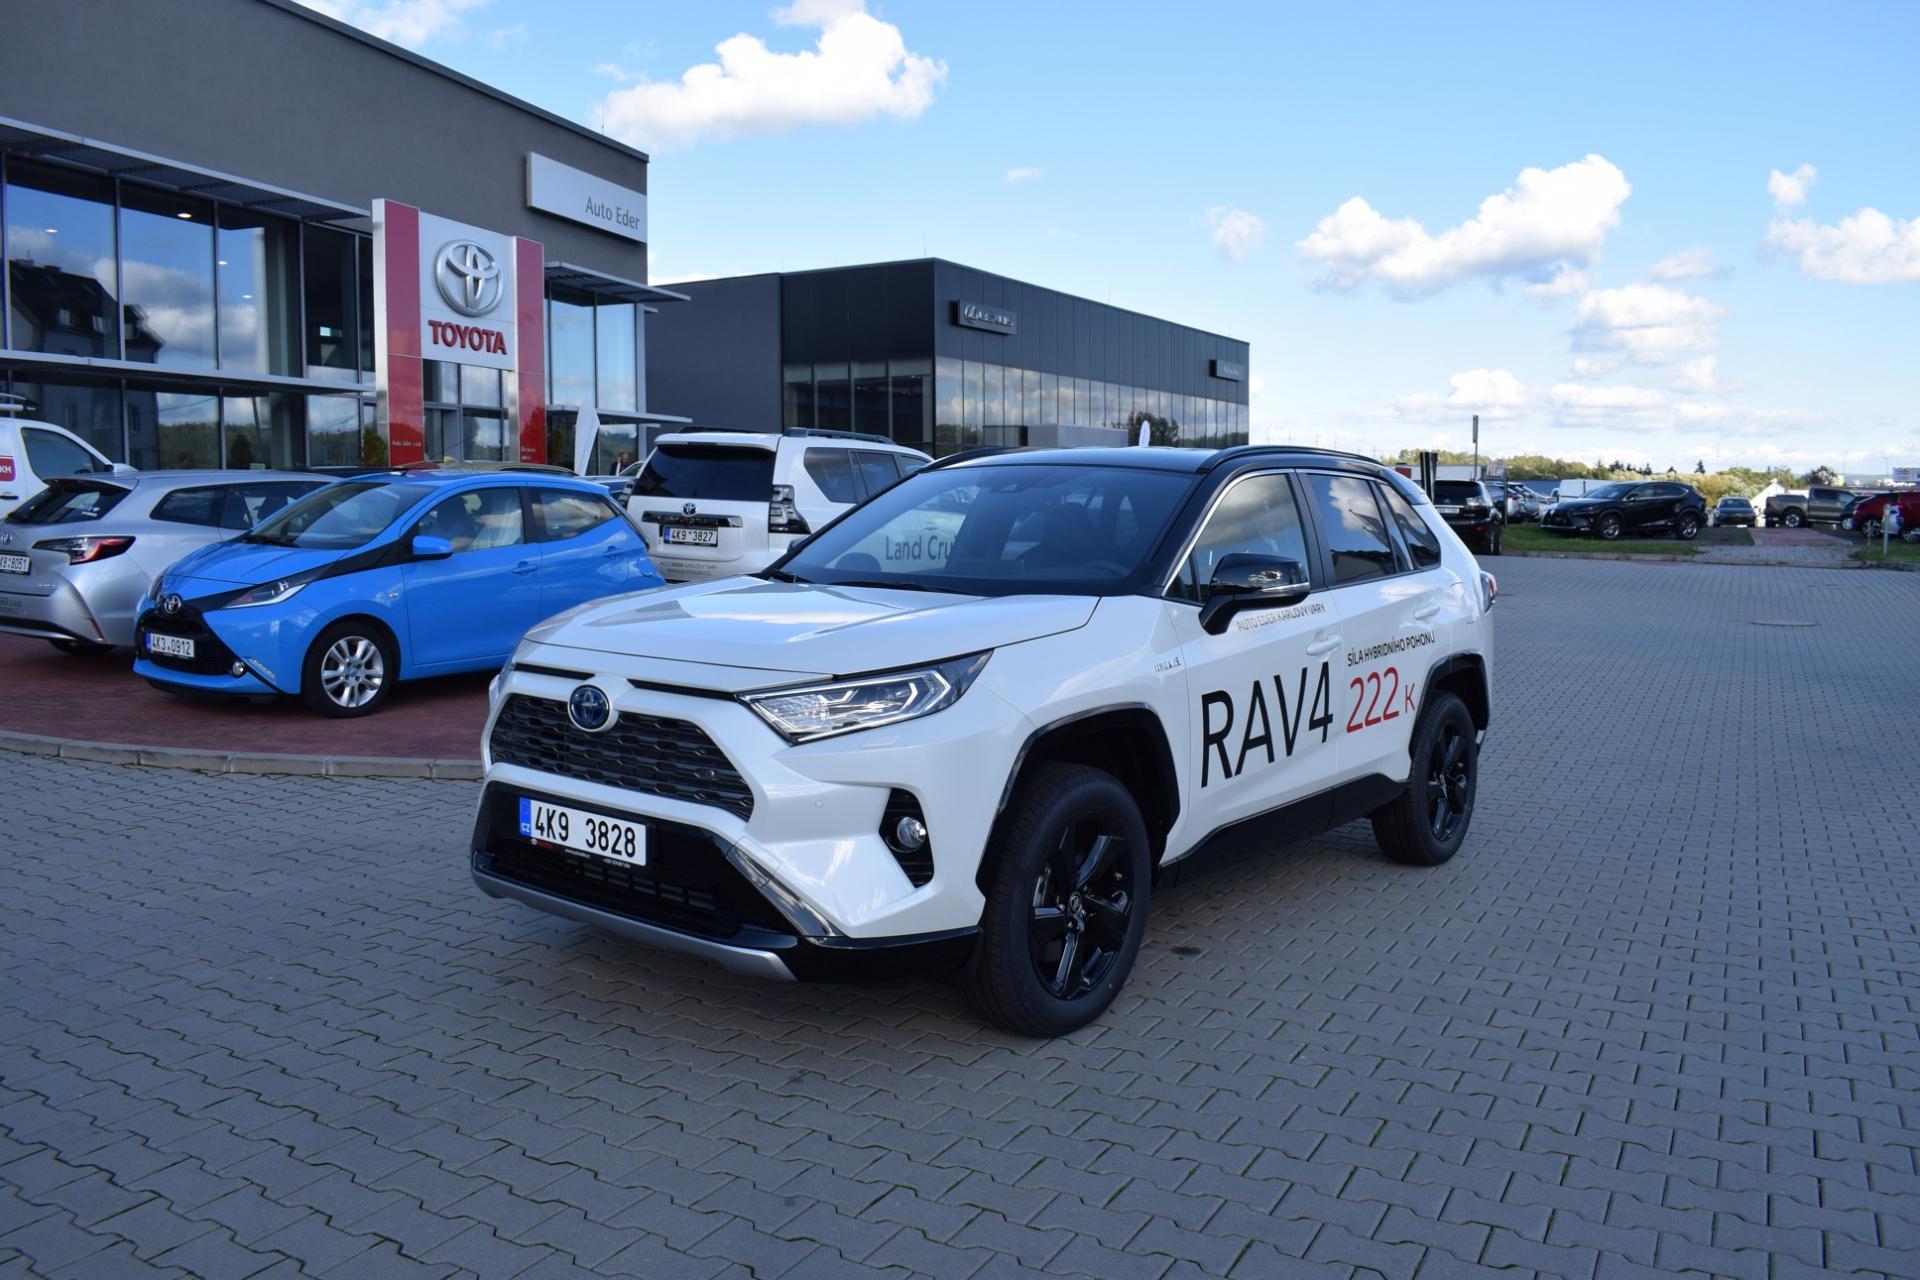 Toyota RAV4 2,5 Hybrid (222k) e-CVT benzin Selection (4x4)